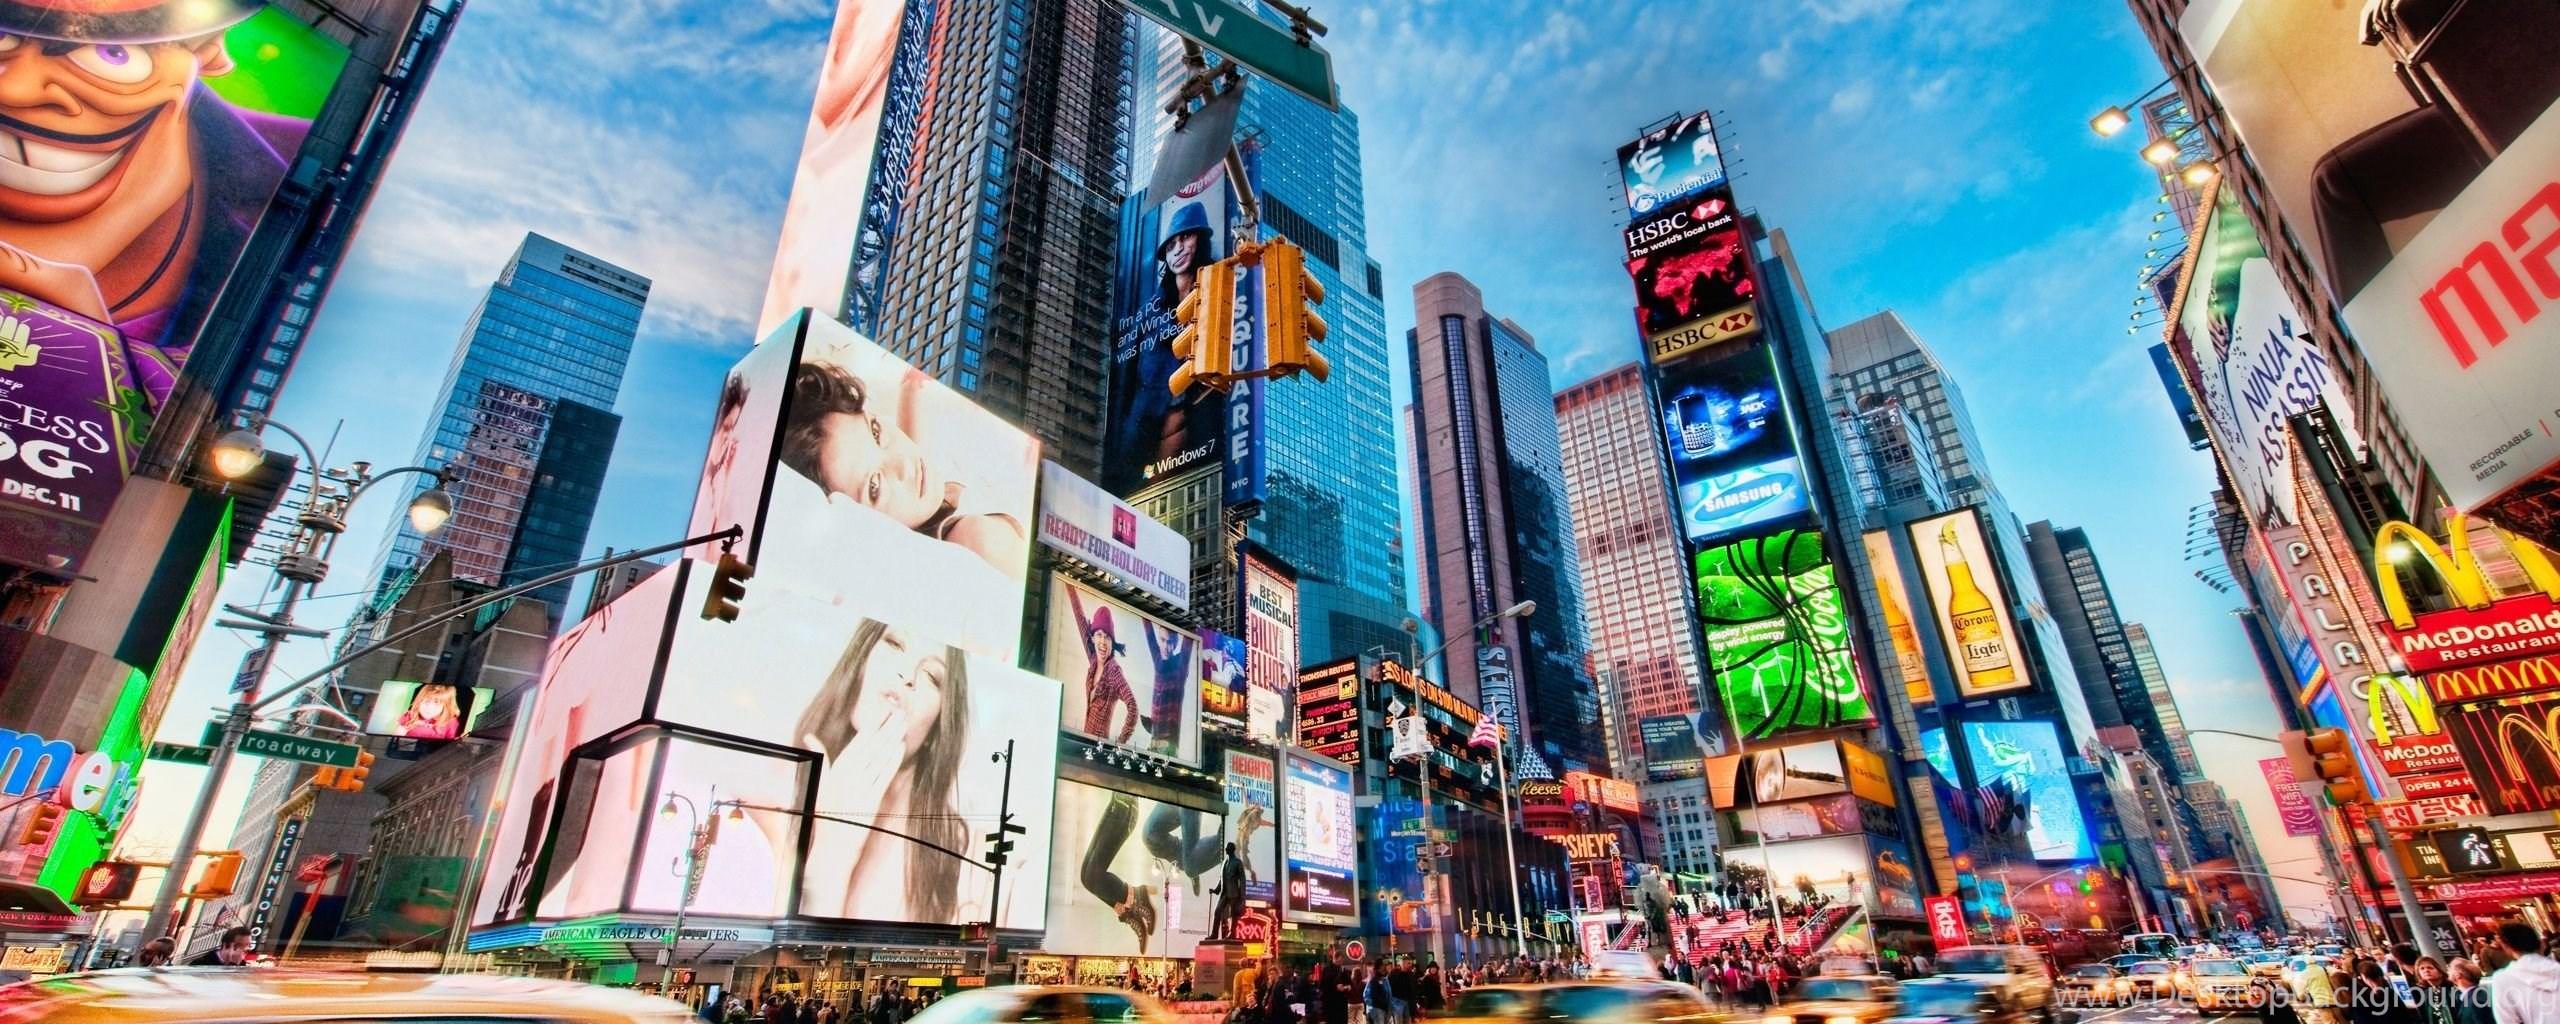 New York Wallpaper Iphone Android Jpg Desktop Background